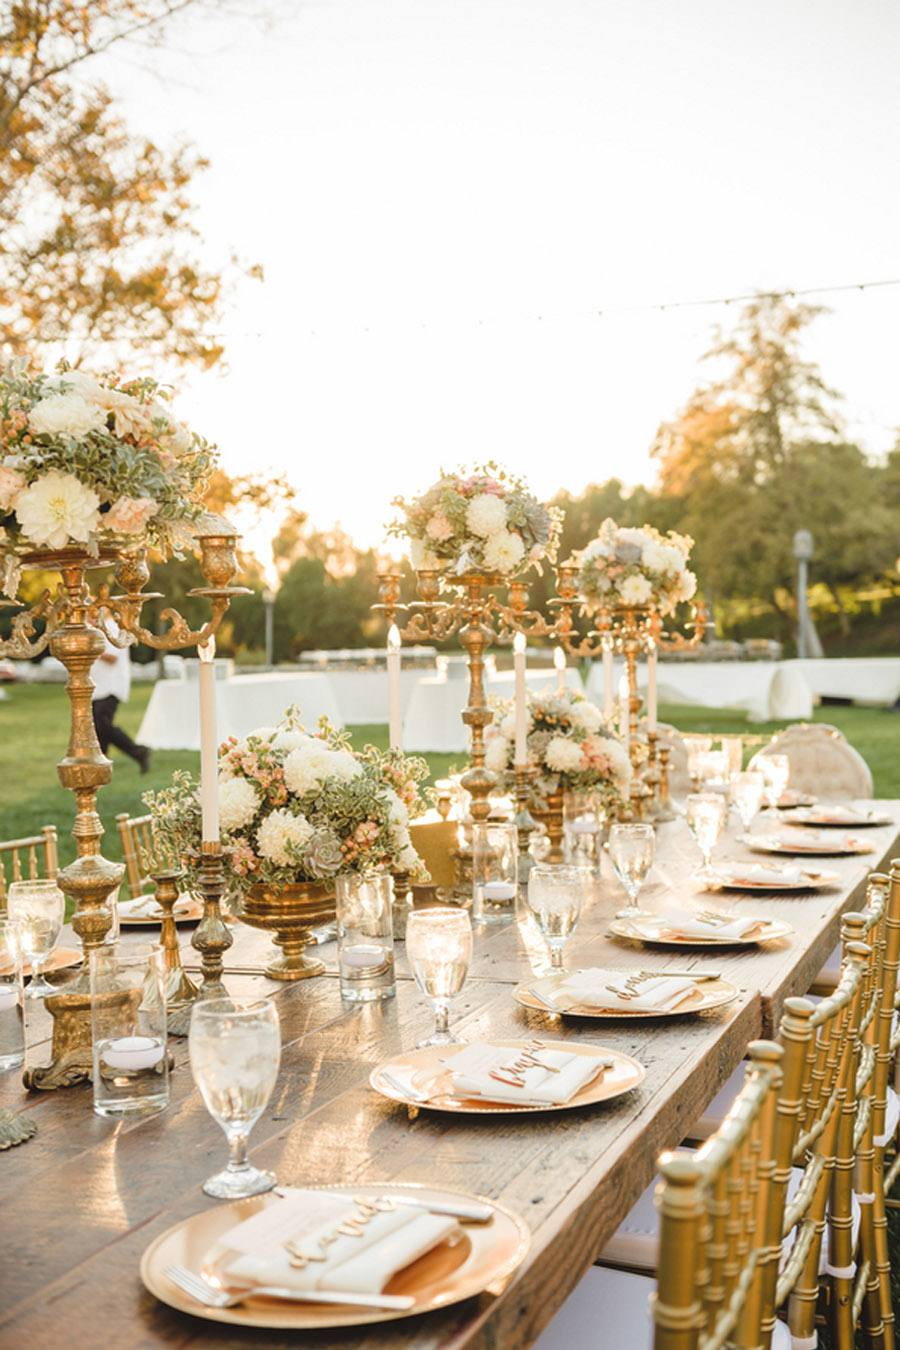 DECORACIÓN DE BODA EN BRONCE decoracion-boda-bronce